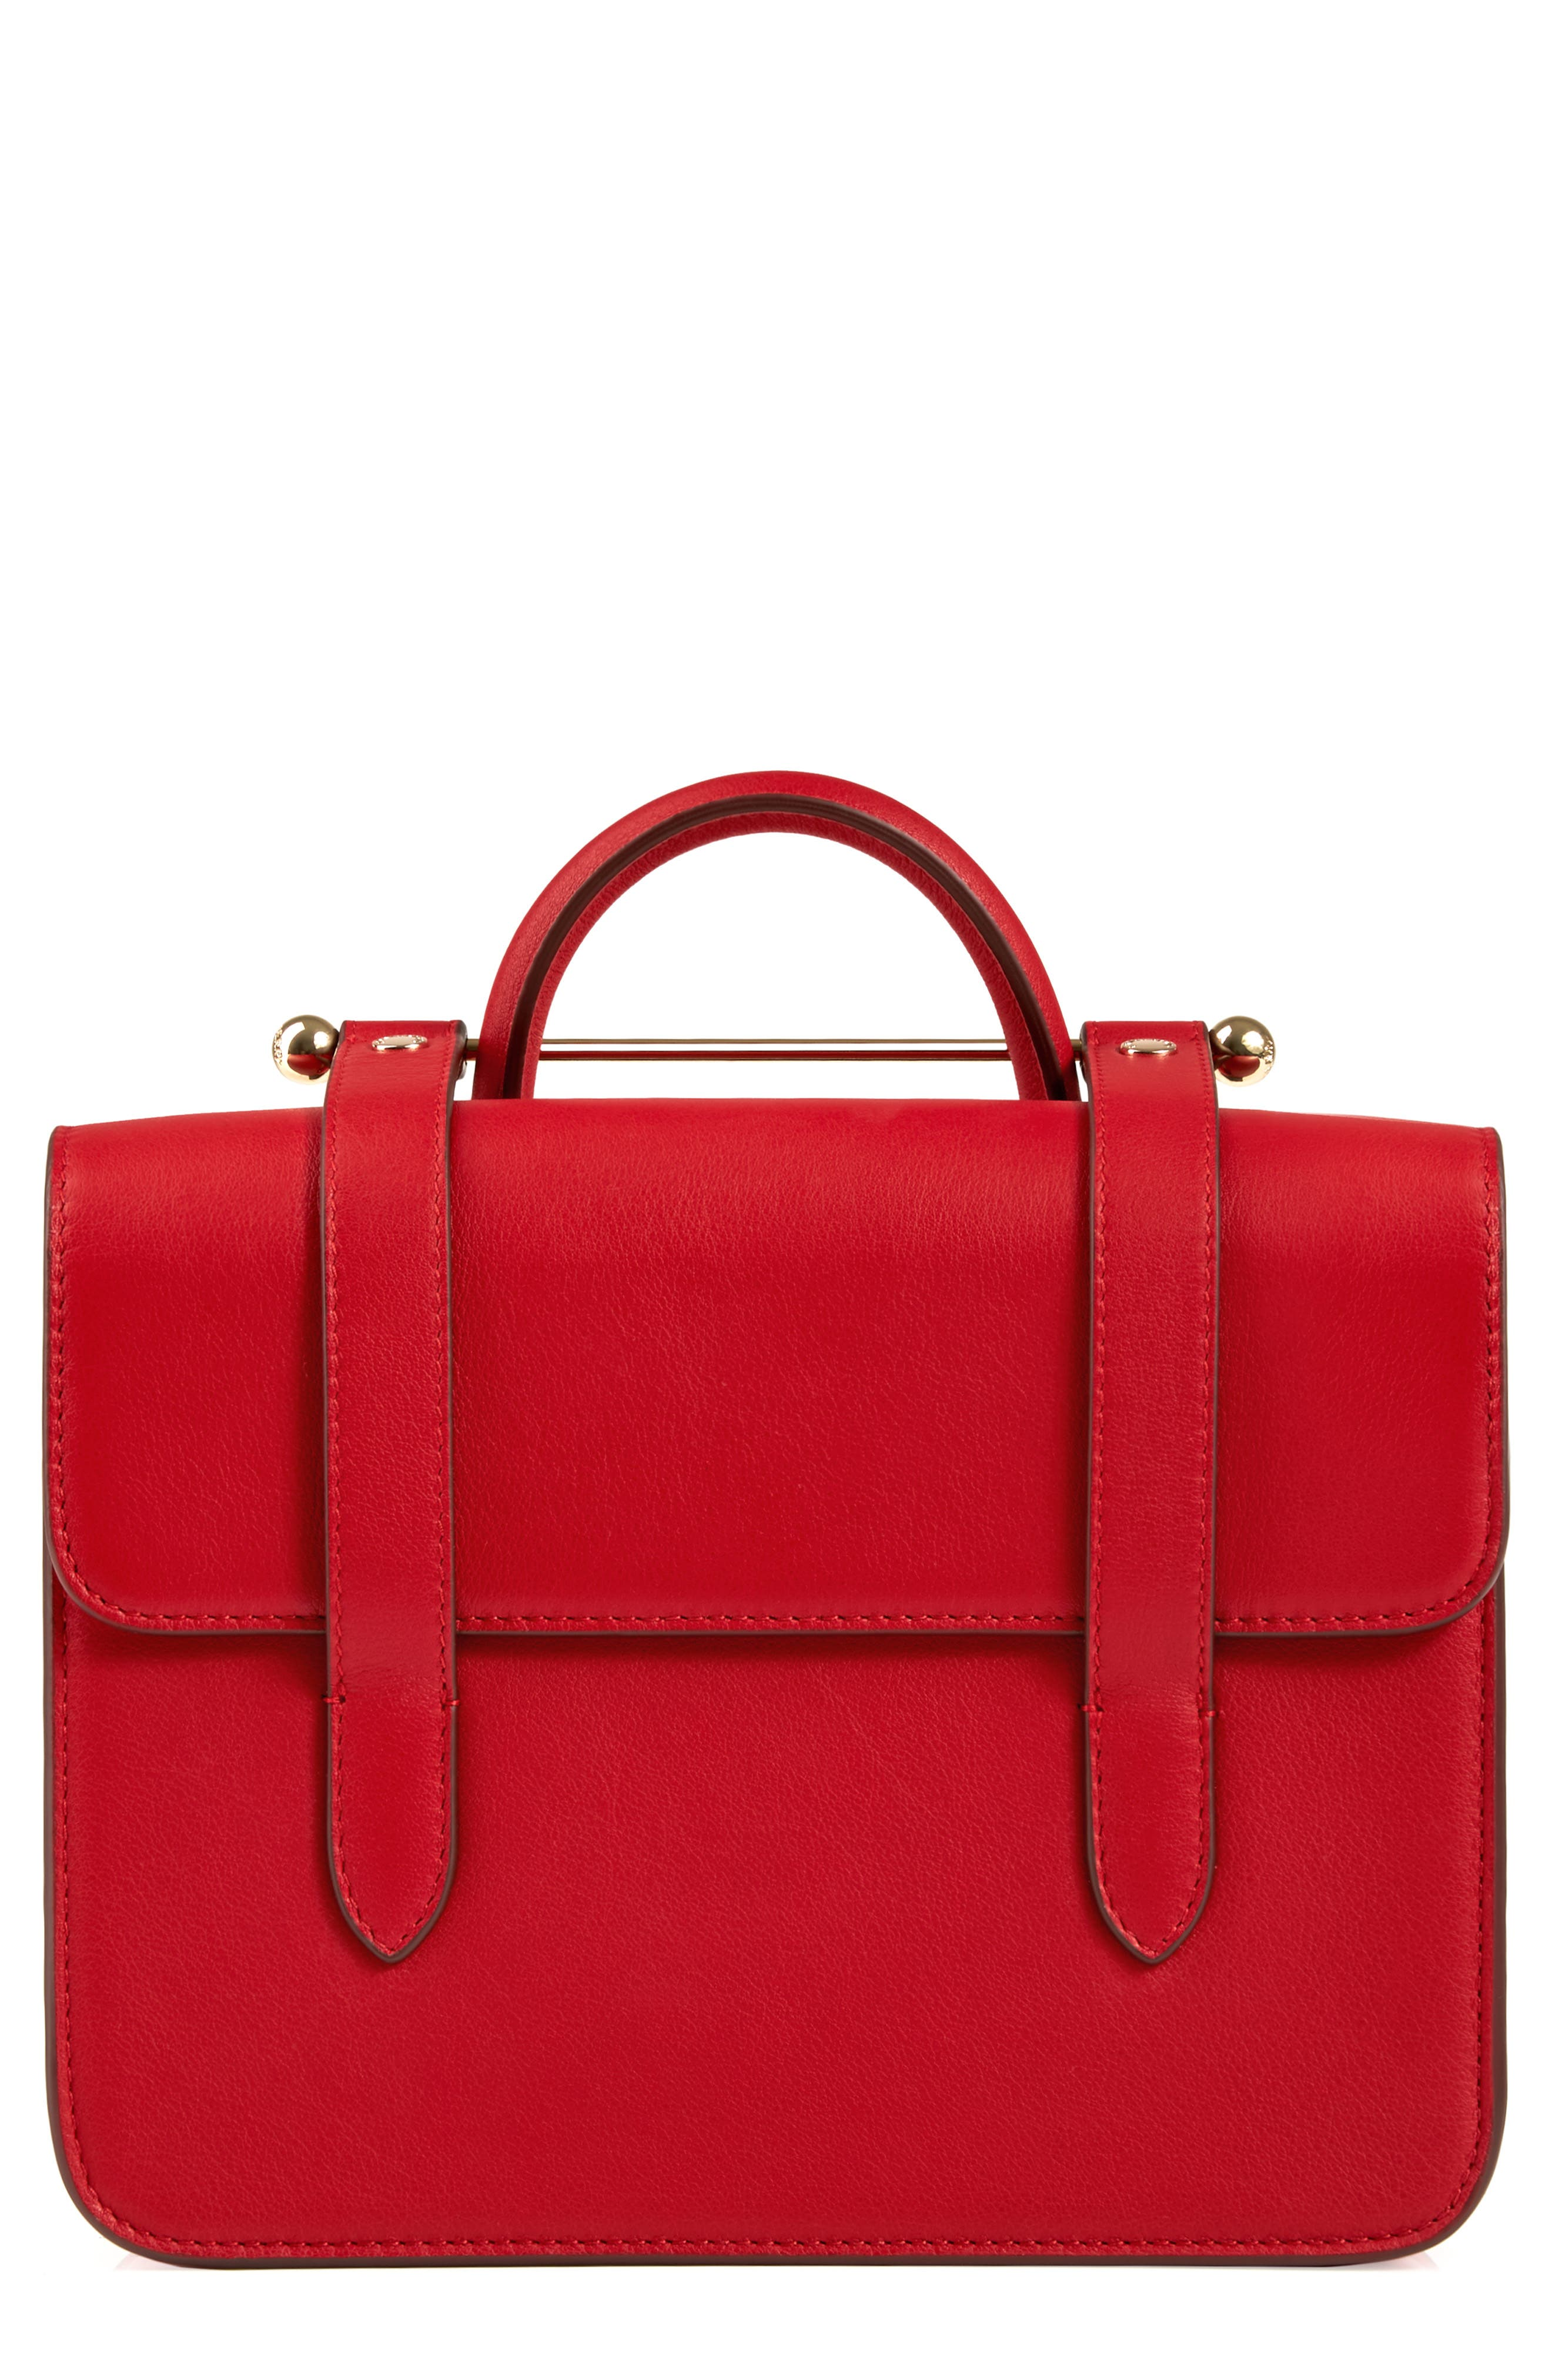 MC Mini Leather Crossbody Bag,                             Main thumbnail 2, color,